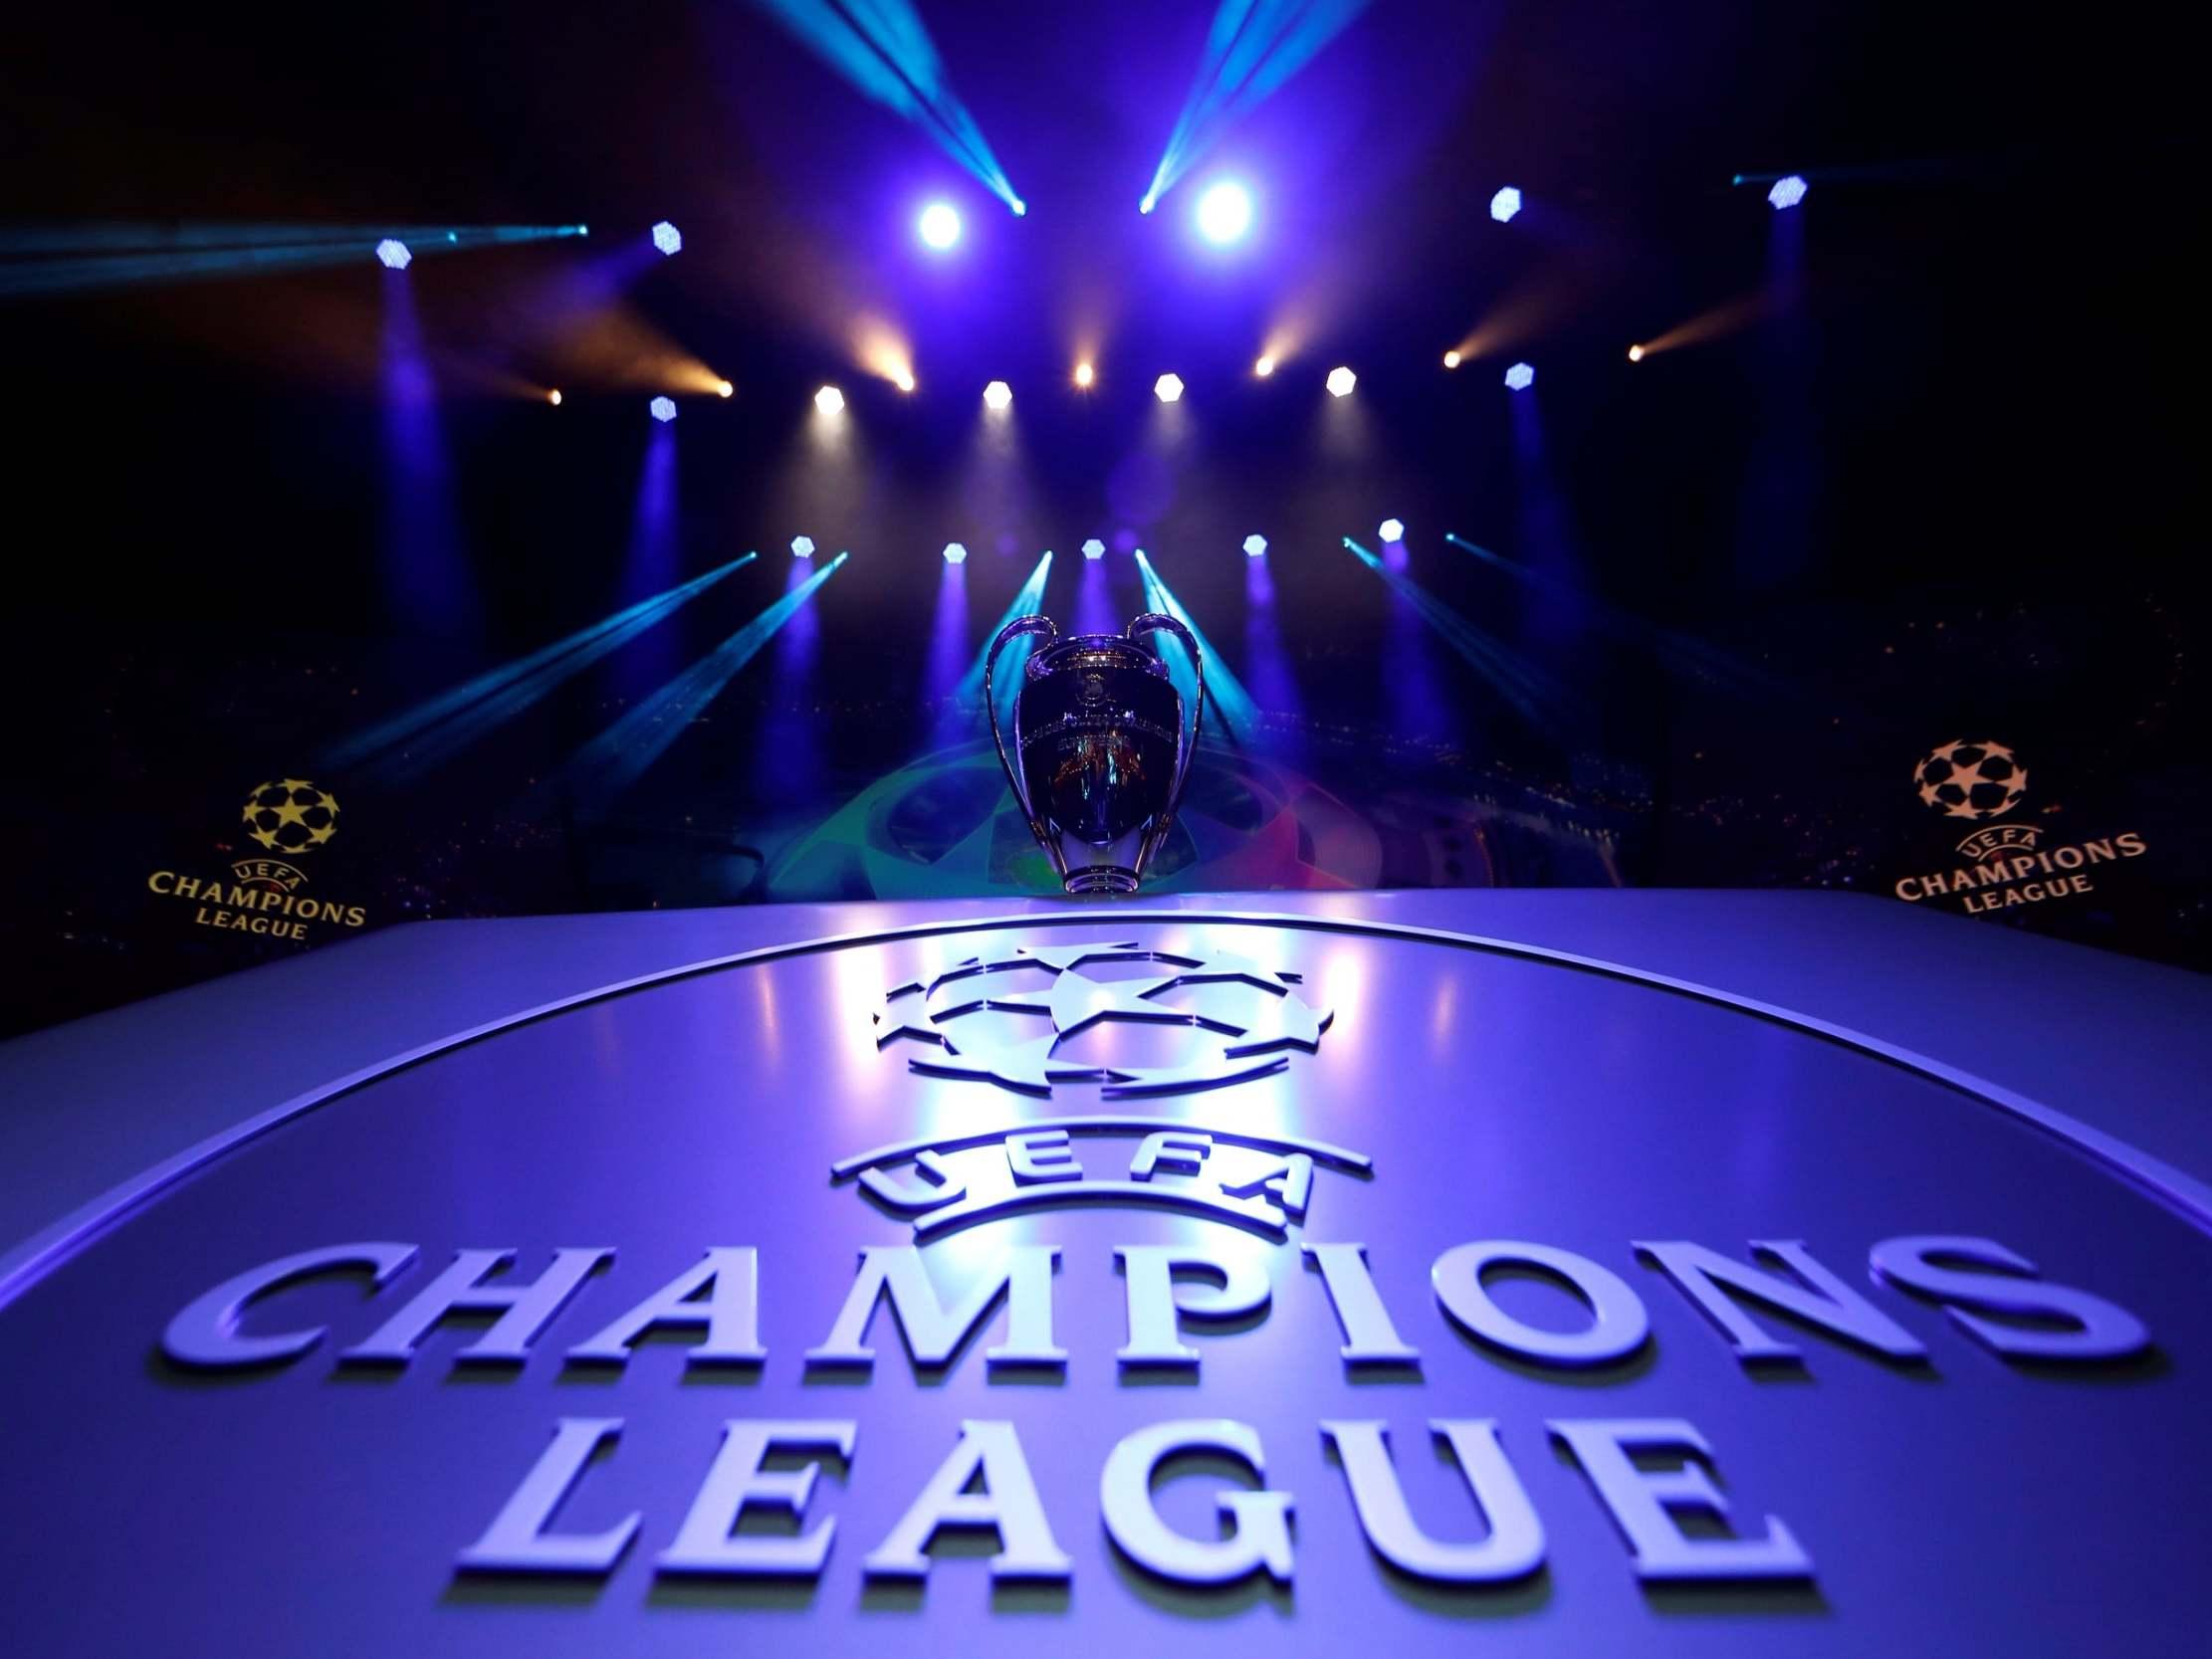 Calendario Champions Juve 2020.Biglietti Juventus Champions League 2019 2020